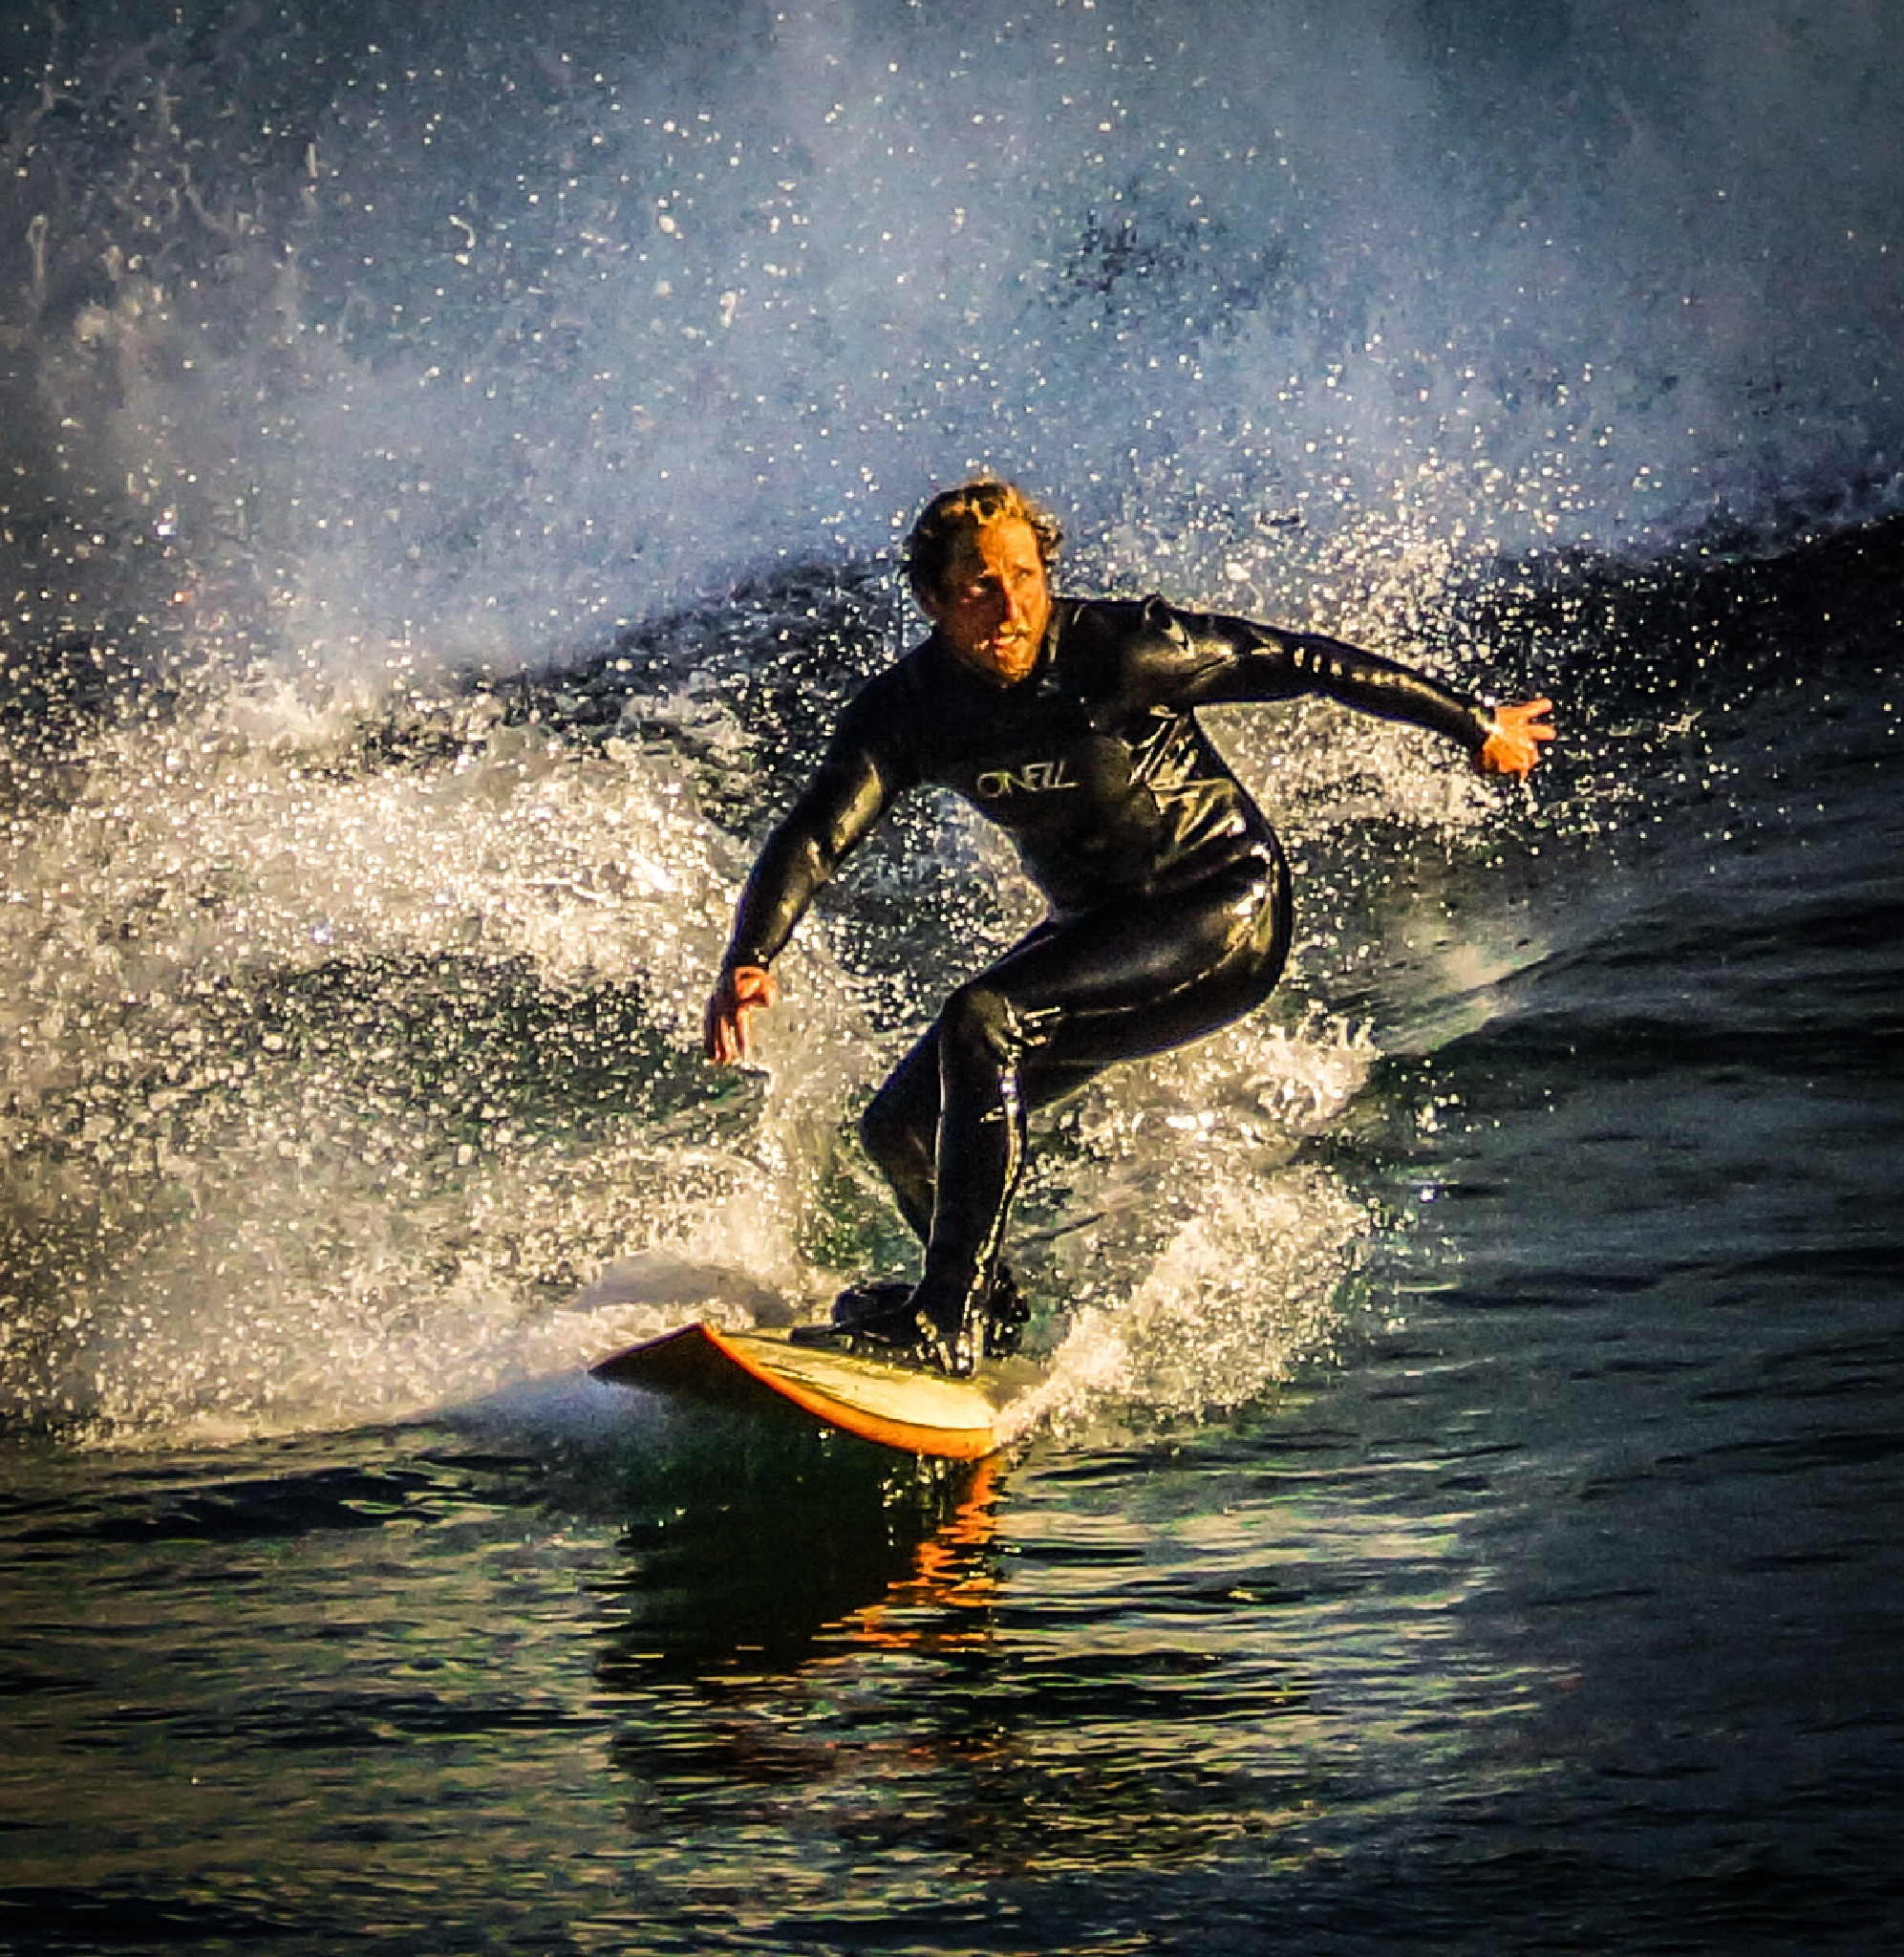 Bis wave surfing, Santa Cruz style by Guido Nagle